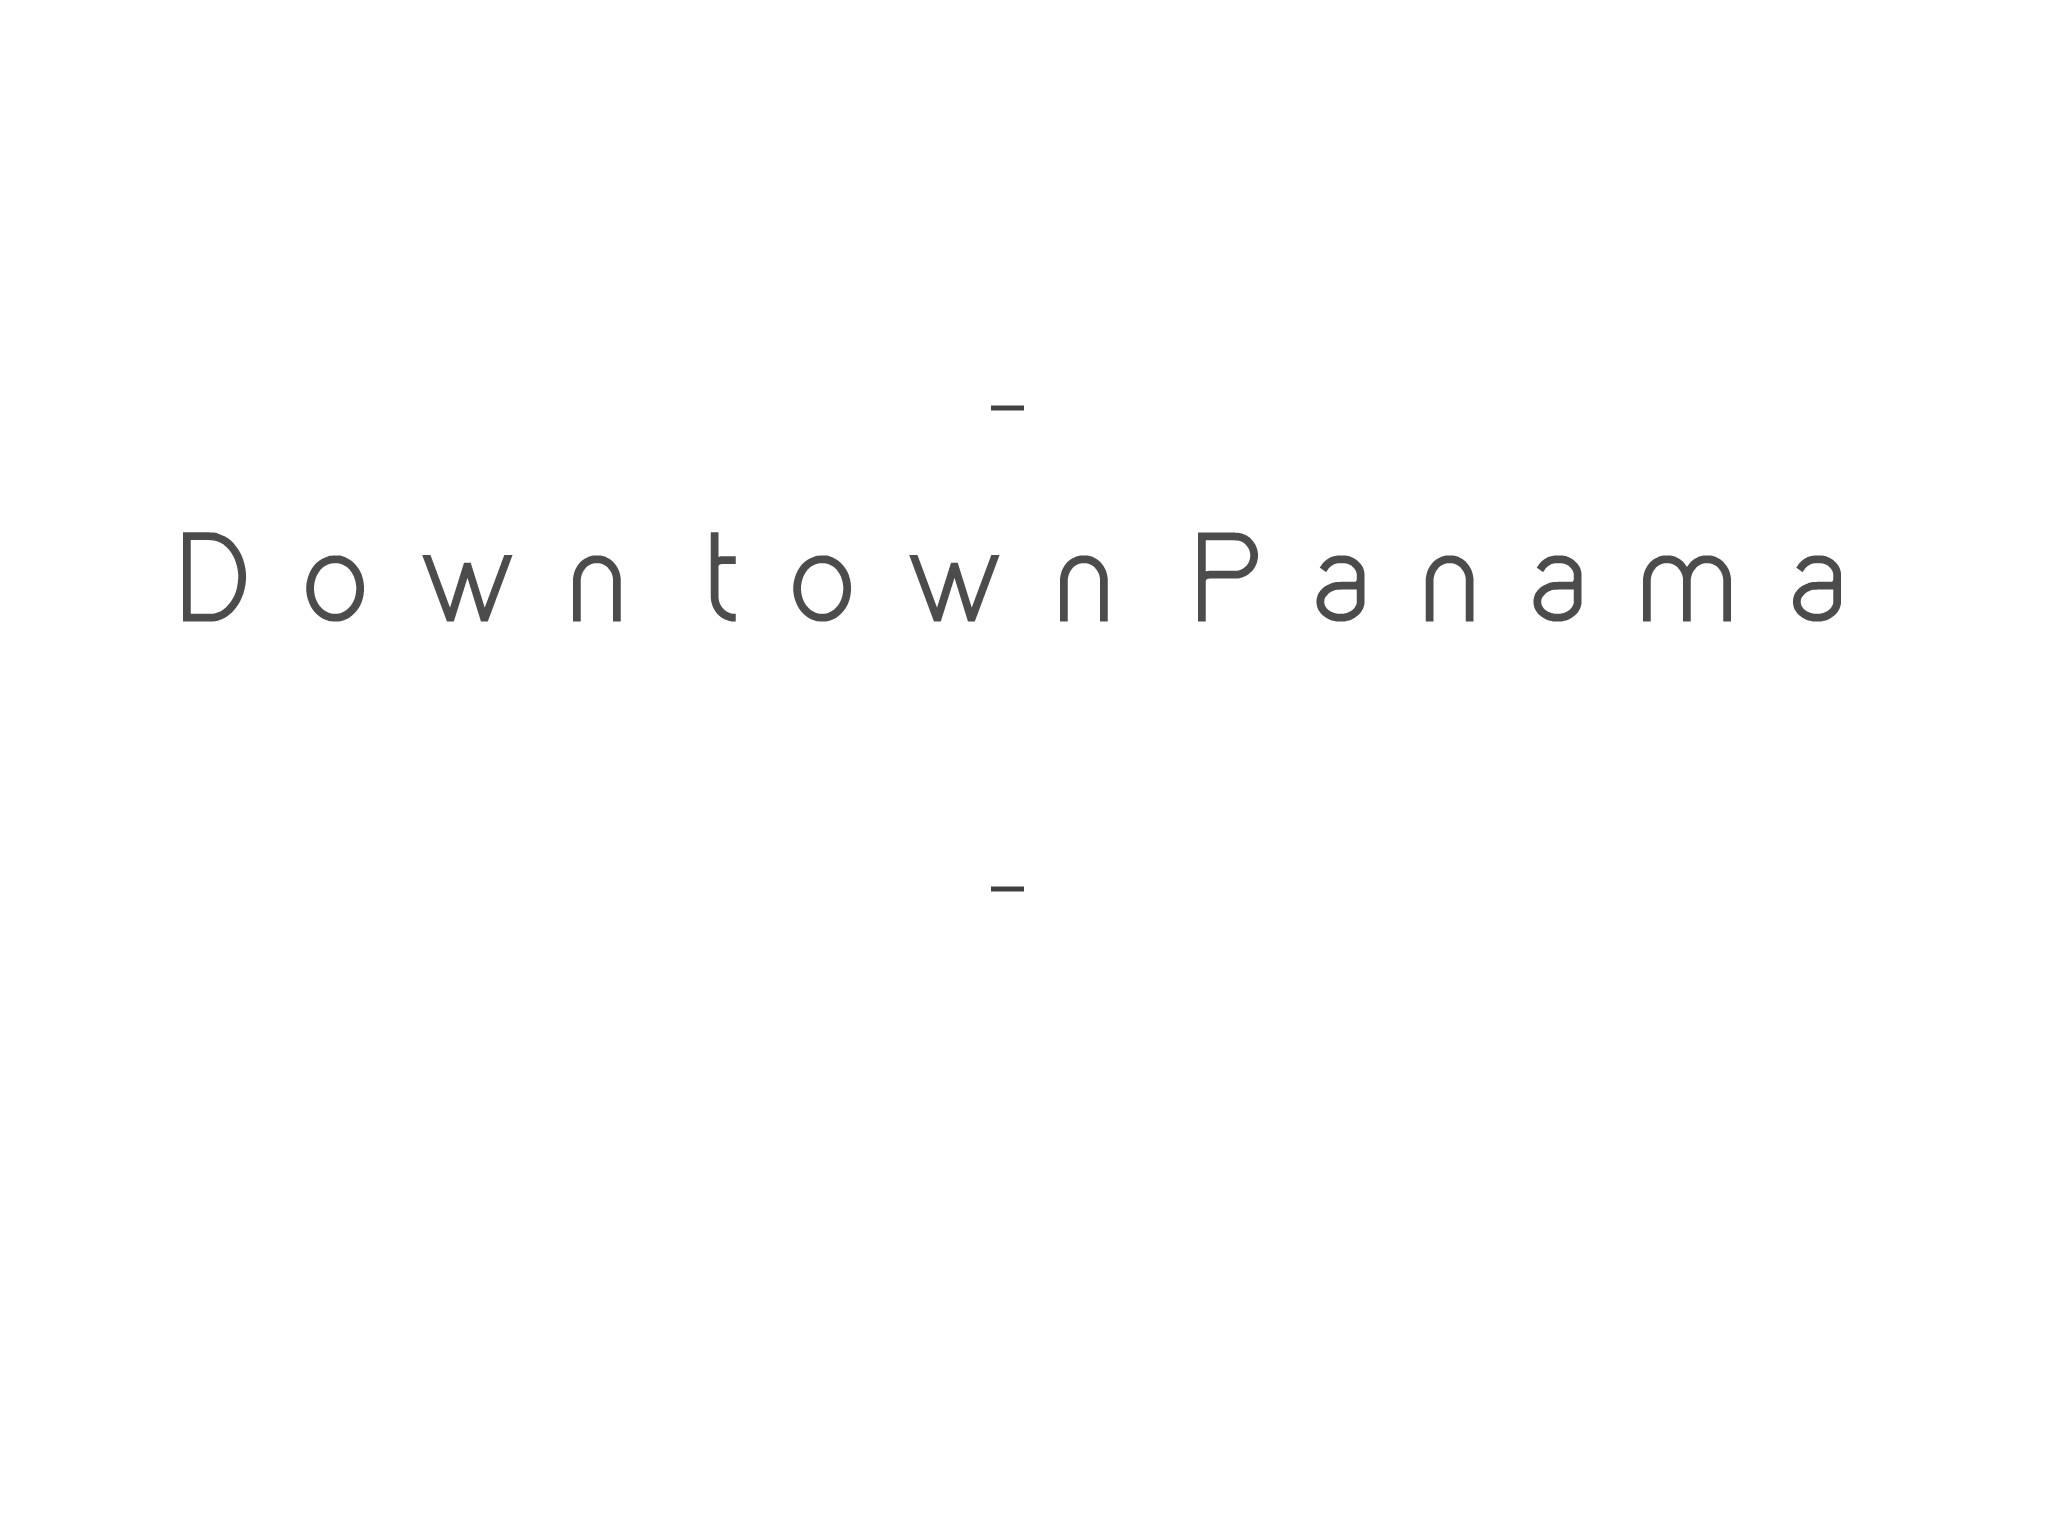 downtown panama.jpg